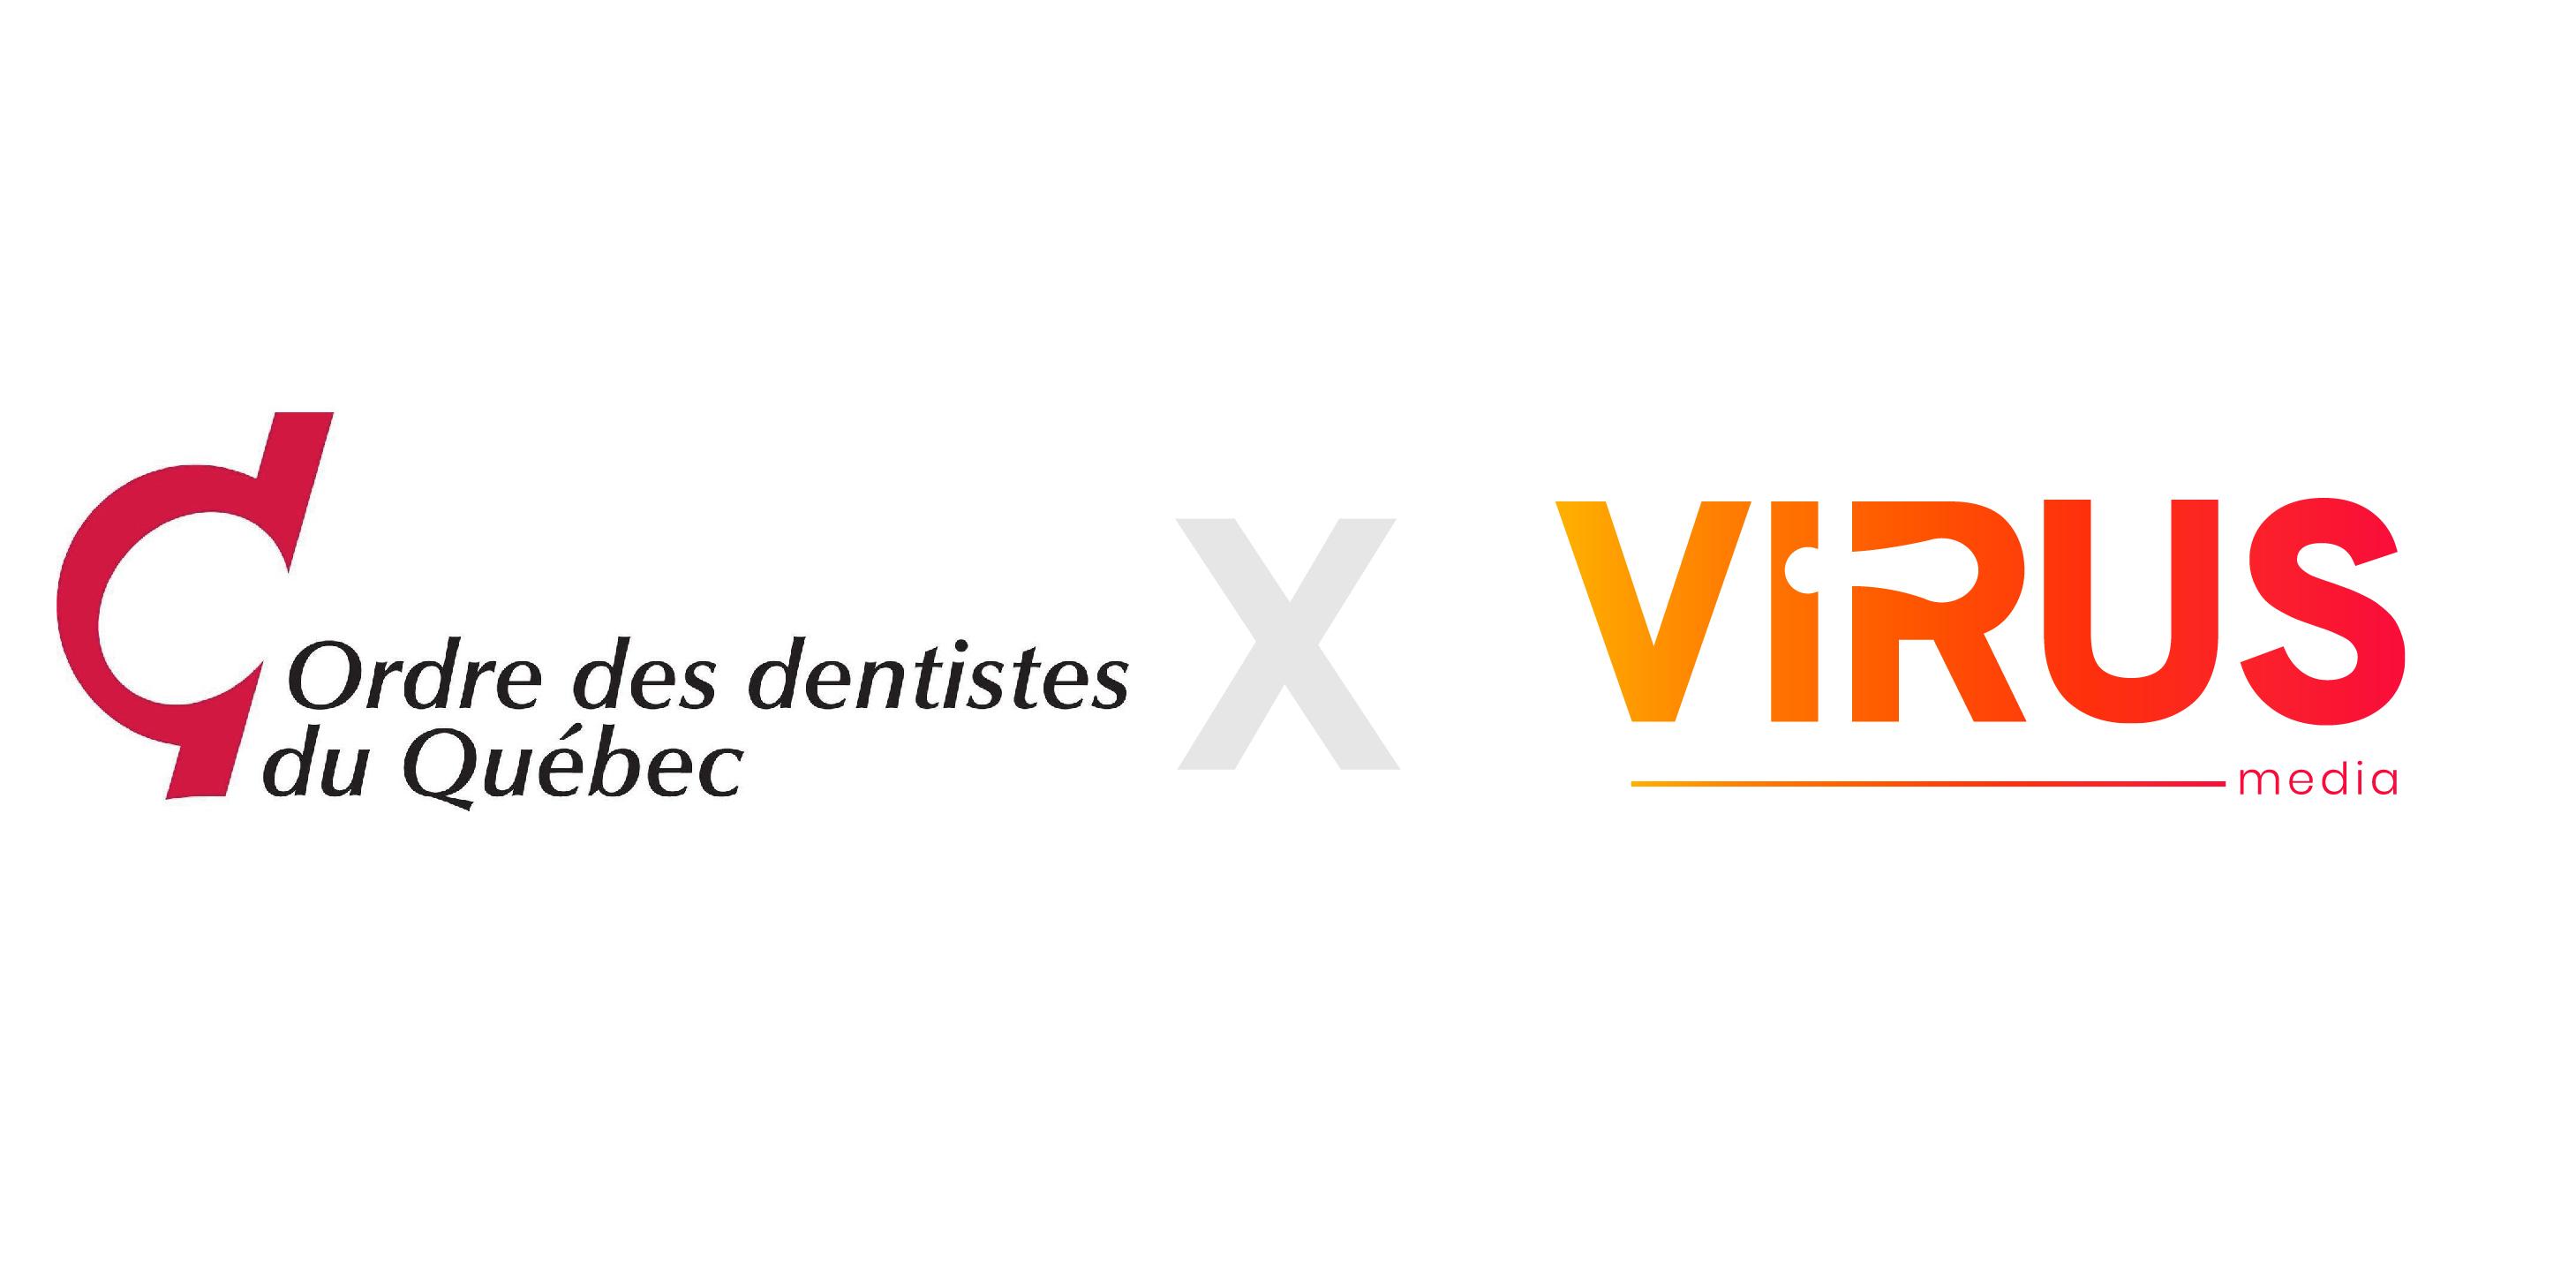 Ordre des dentistes x Virus Média